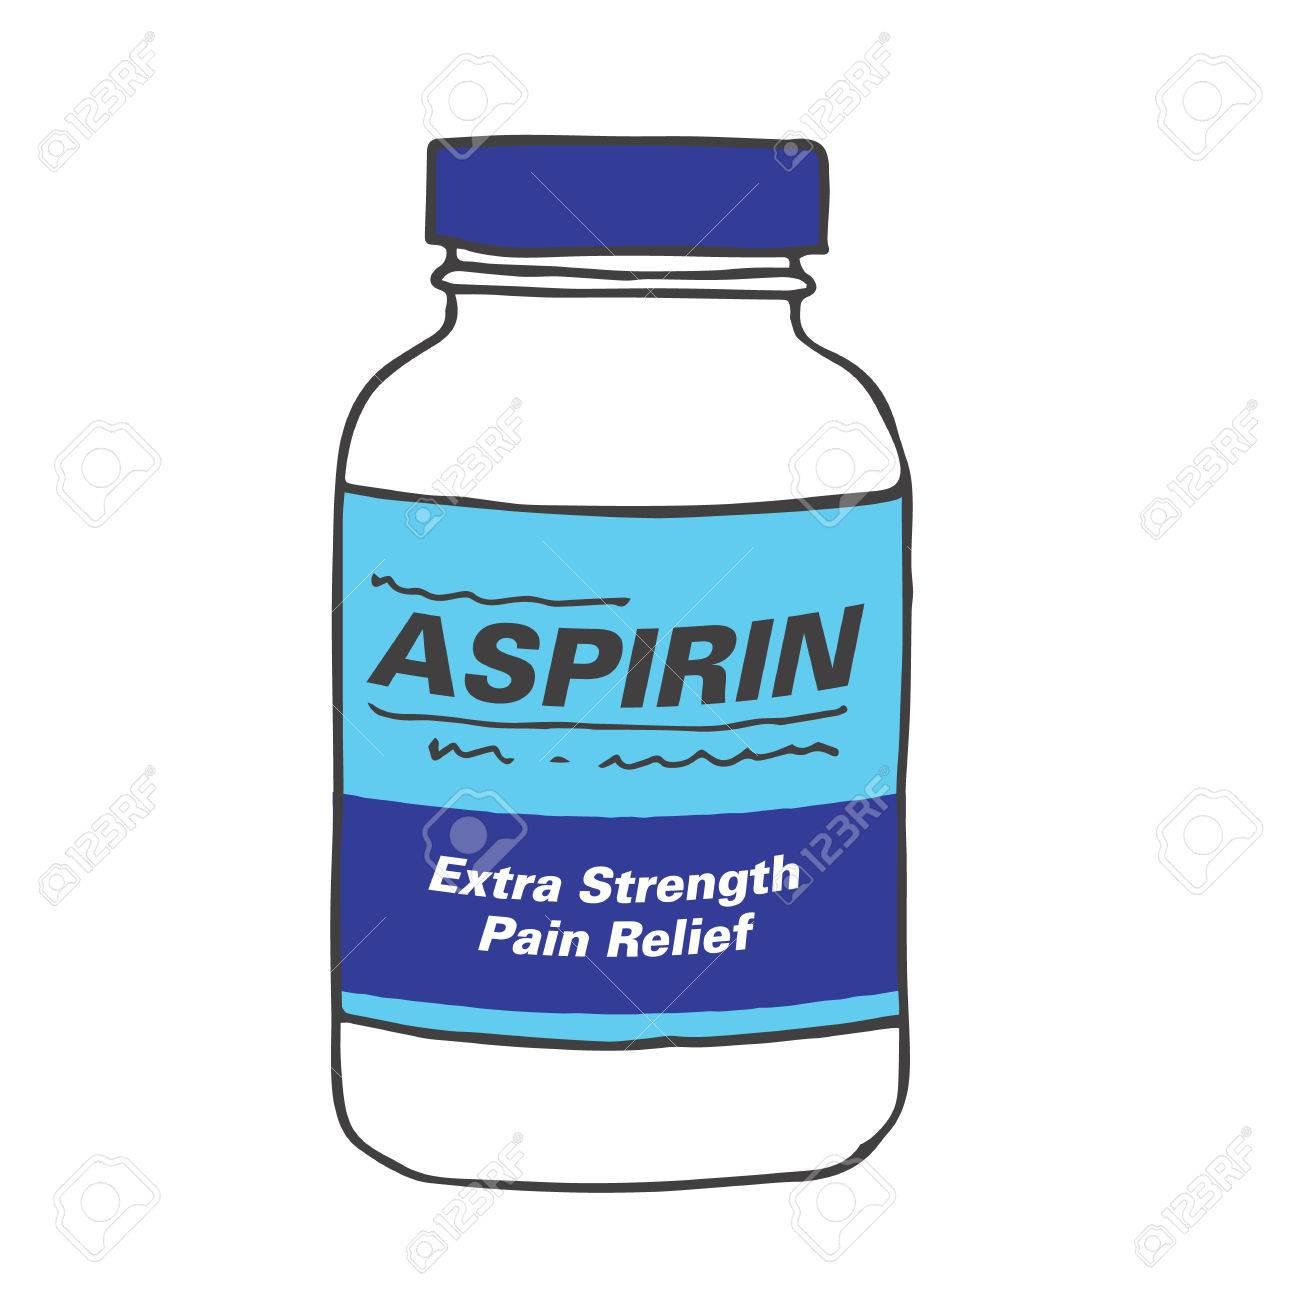 Image result for cartoon aspirin bottle